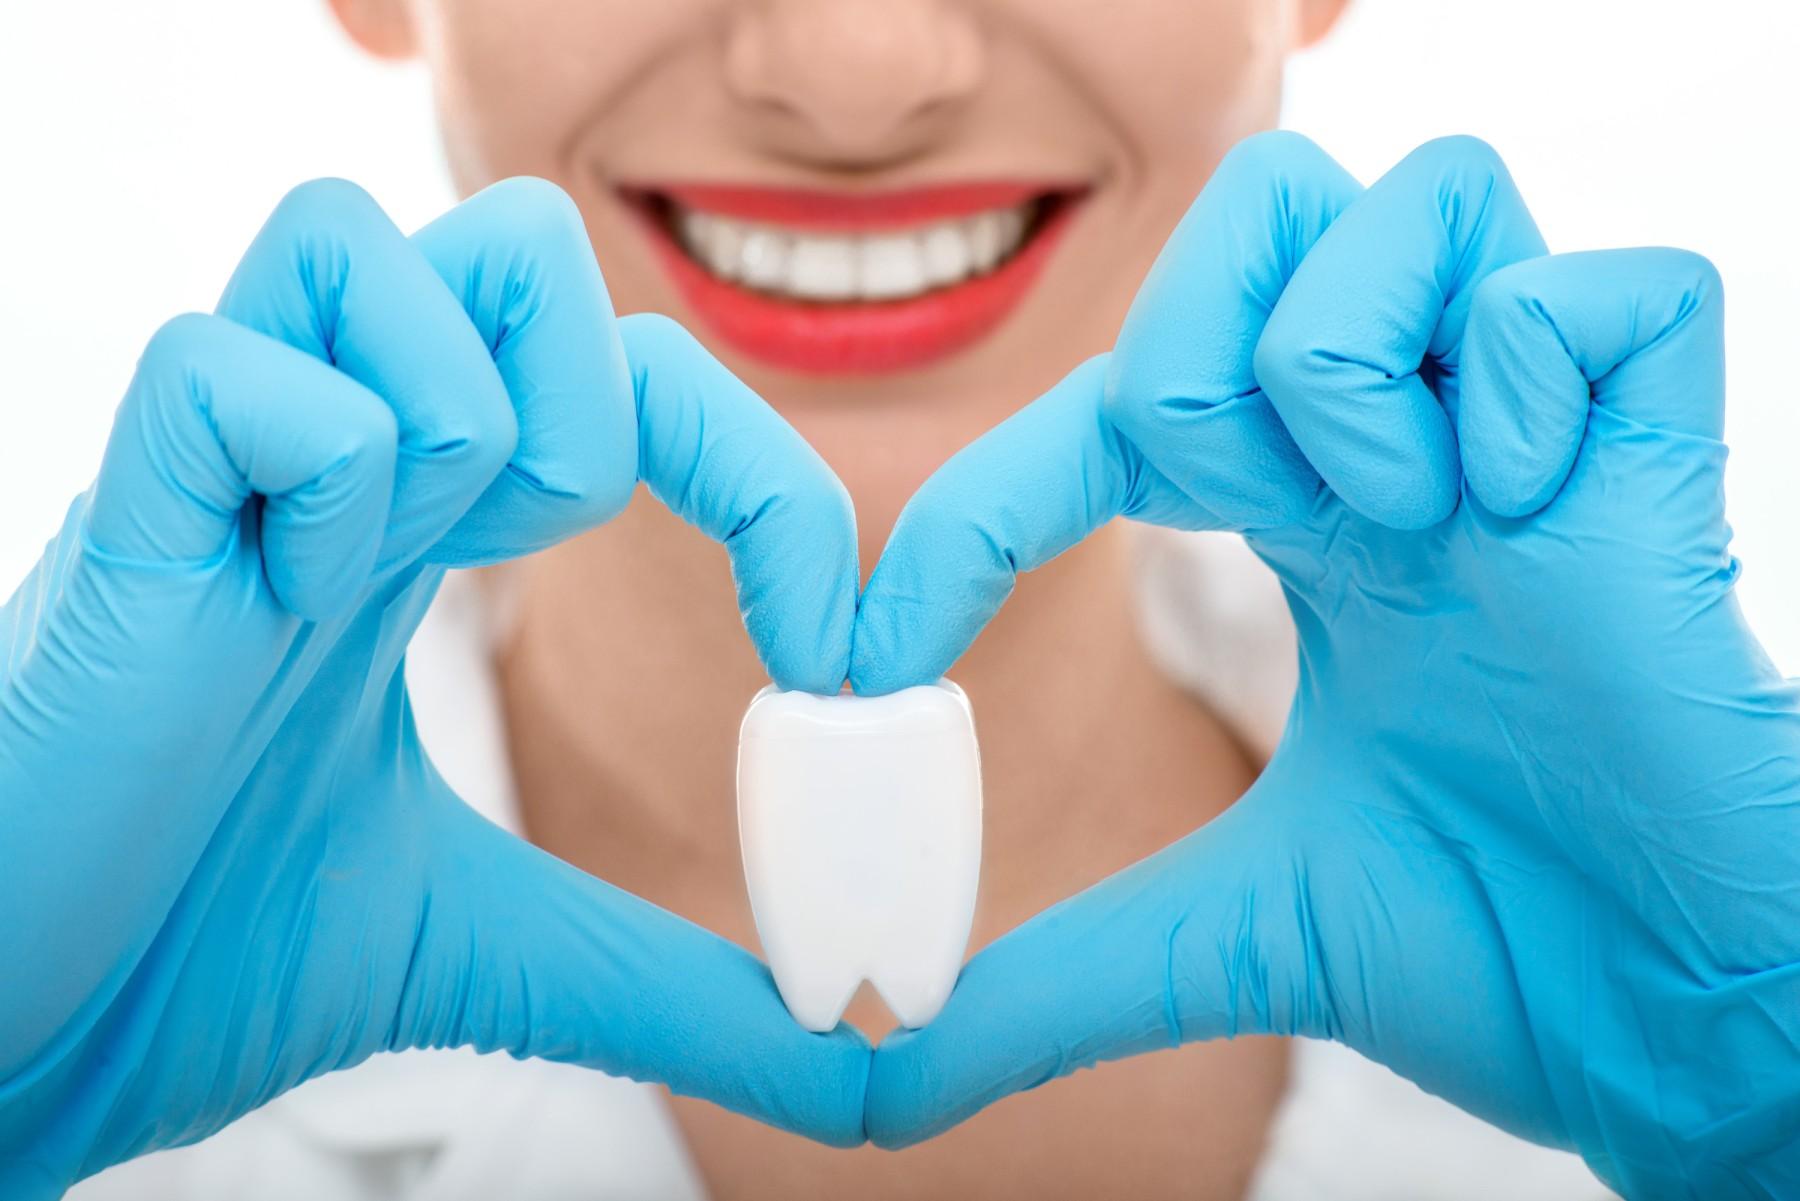 How To Avoid Cavities